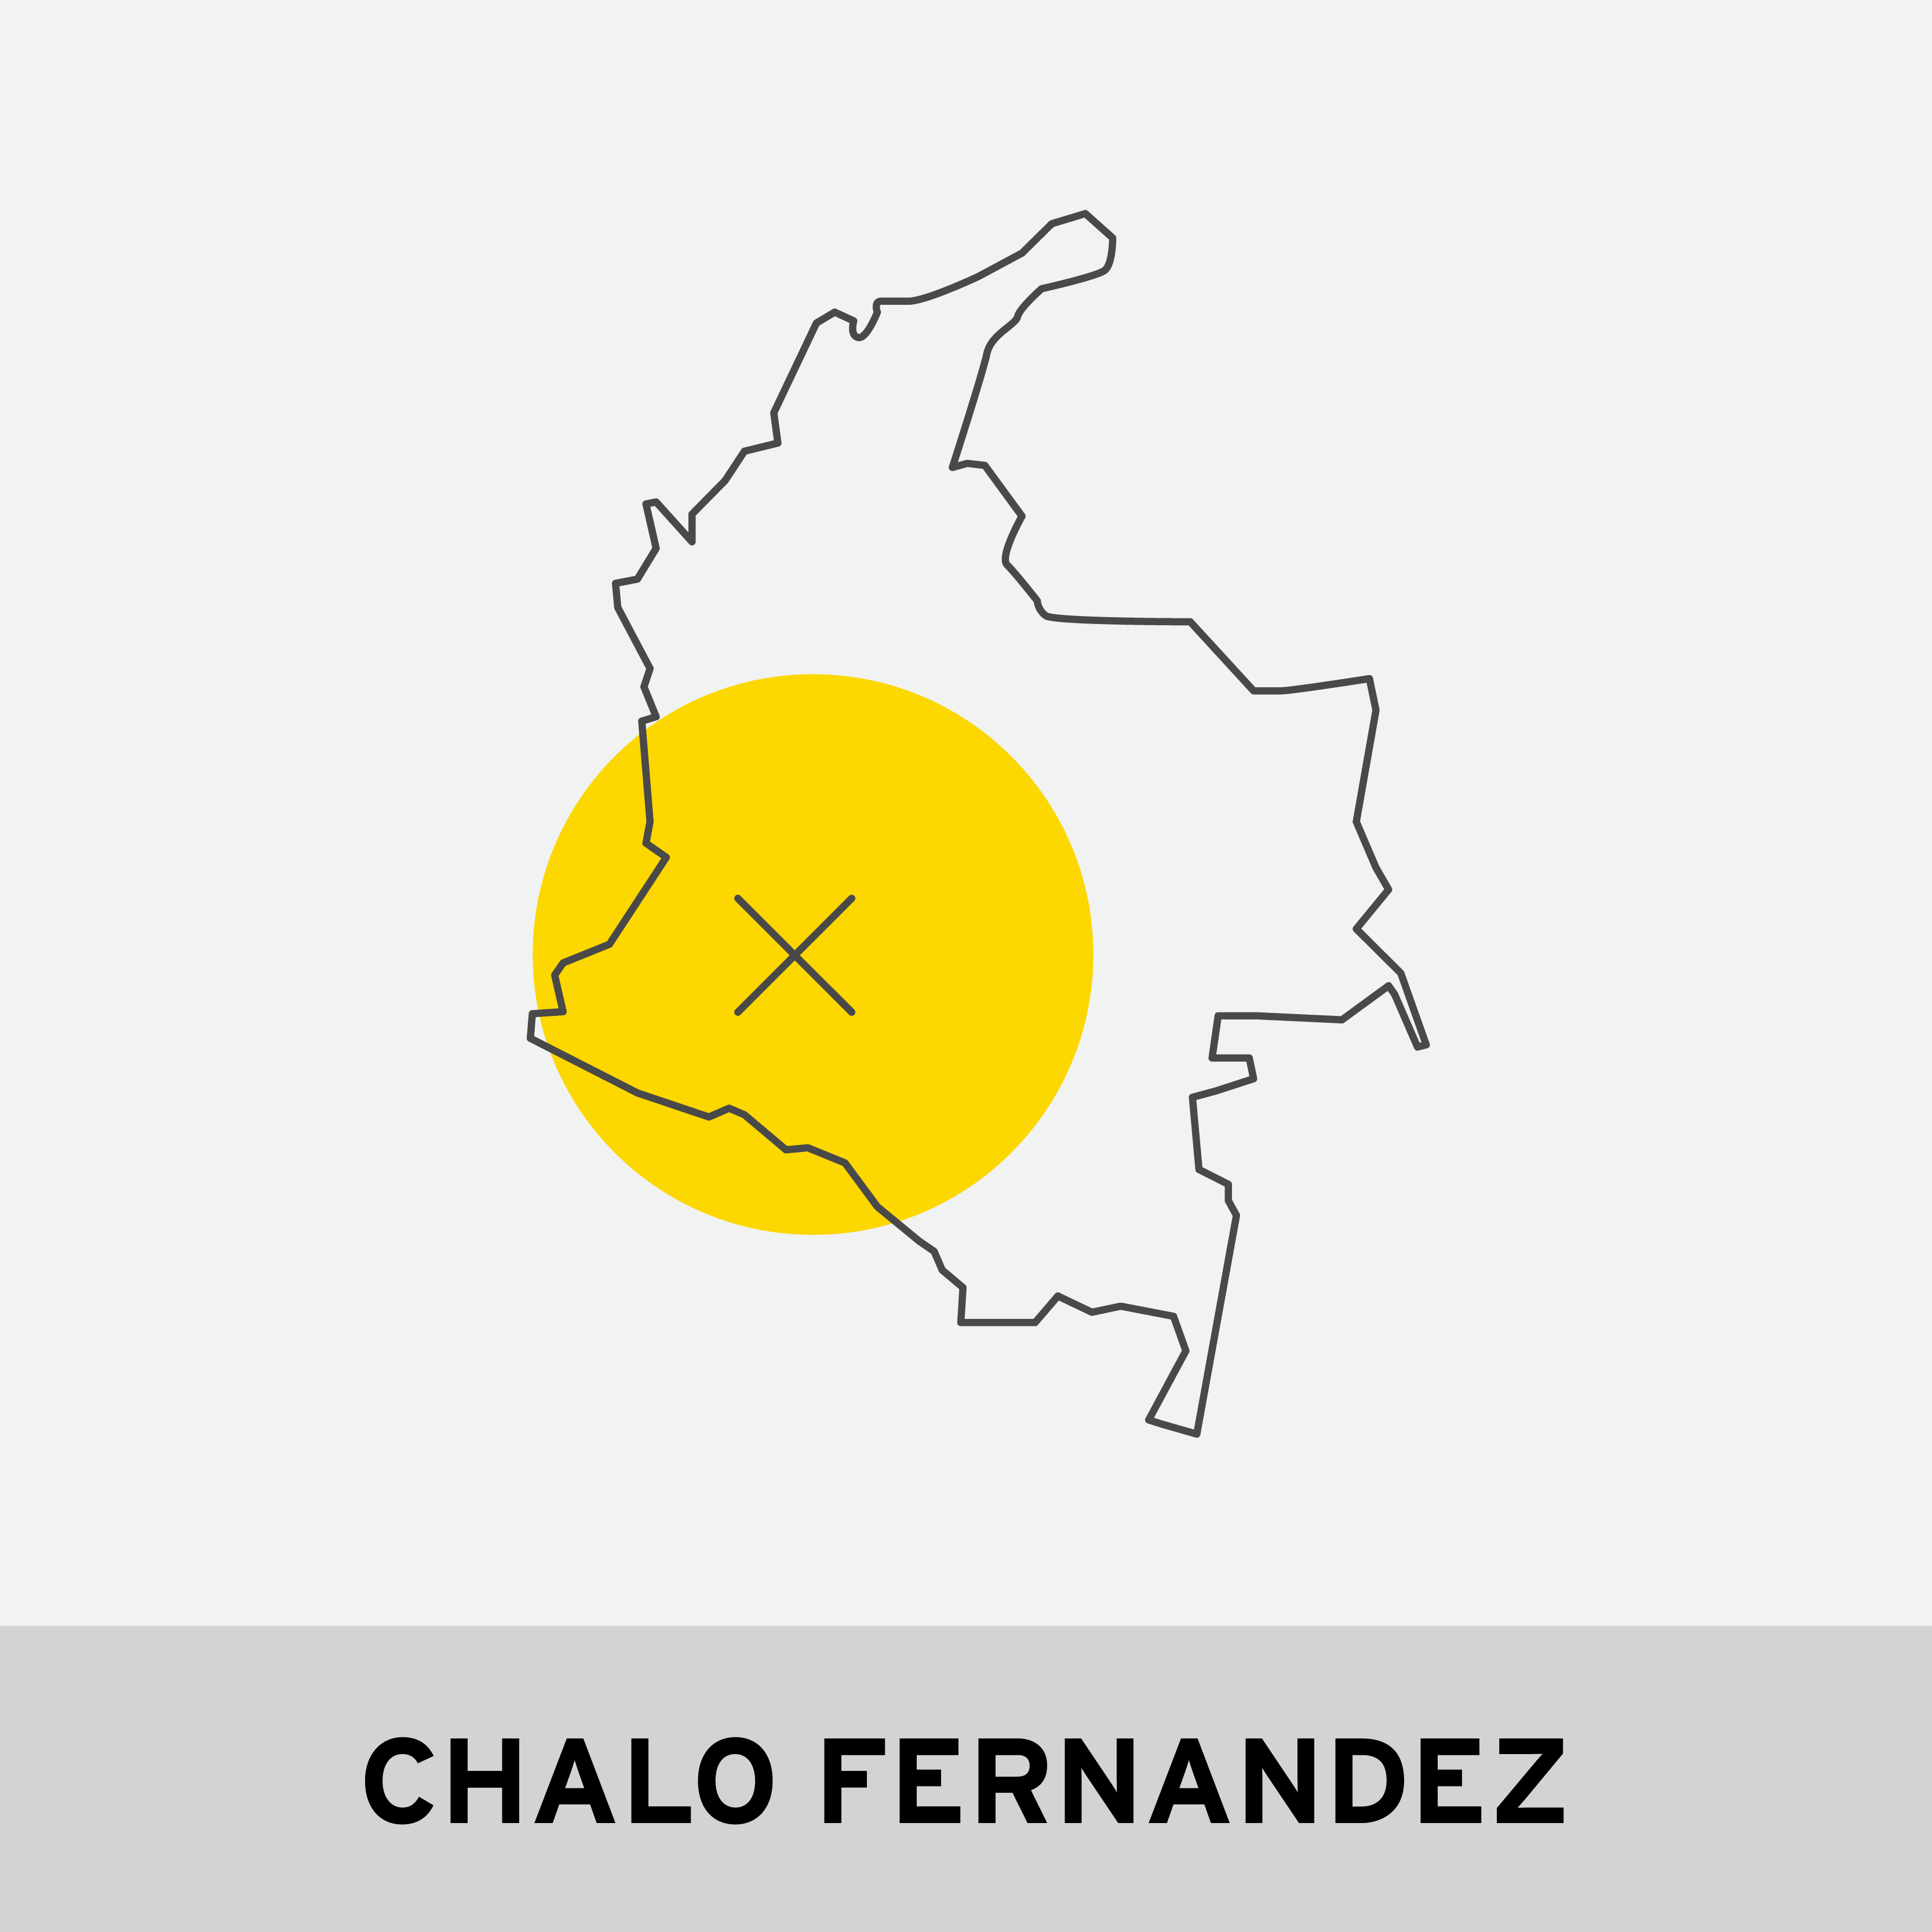 CHALO FERNANDEZ – LAS PALMAS